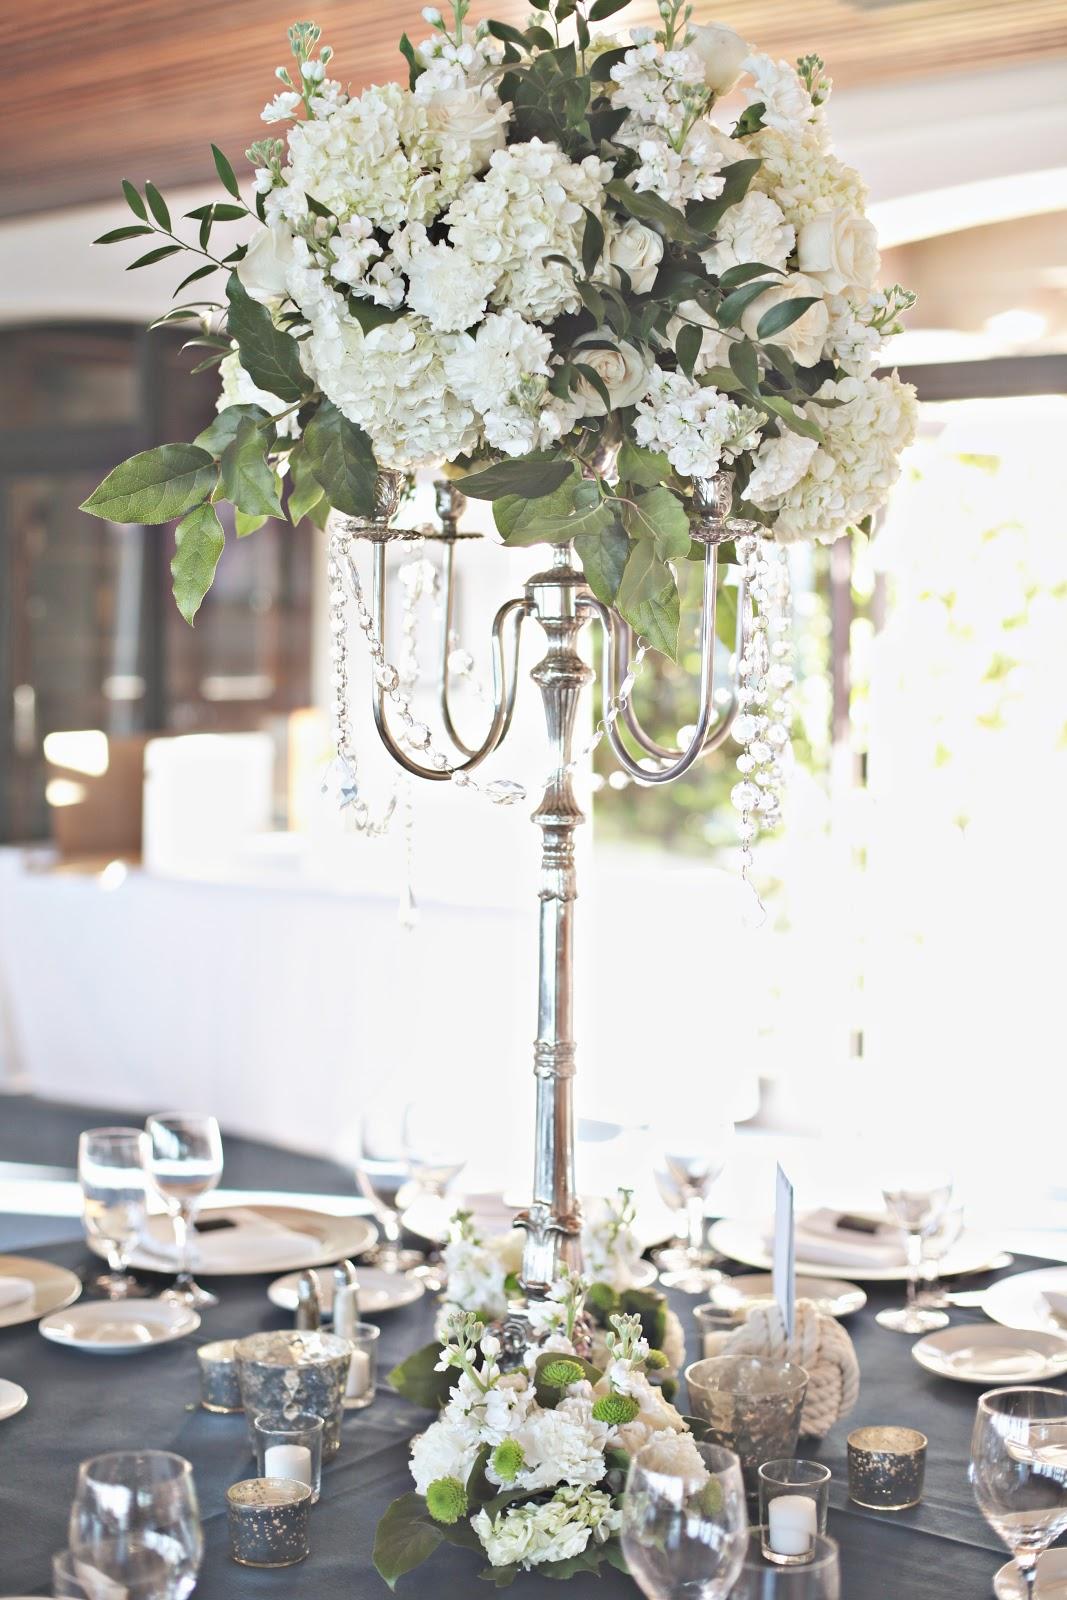 In Full Bloom by MJL: Nautical Blue & White Wedding - Golden Gate ...